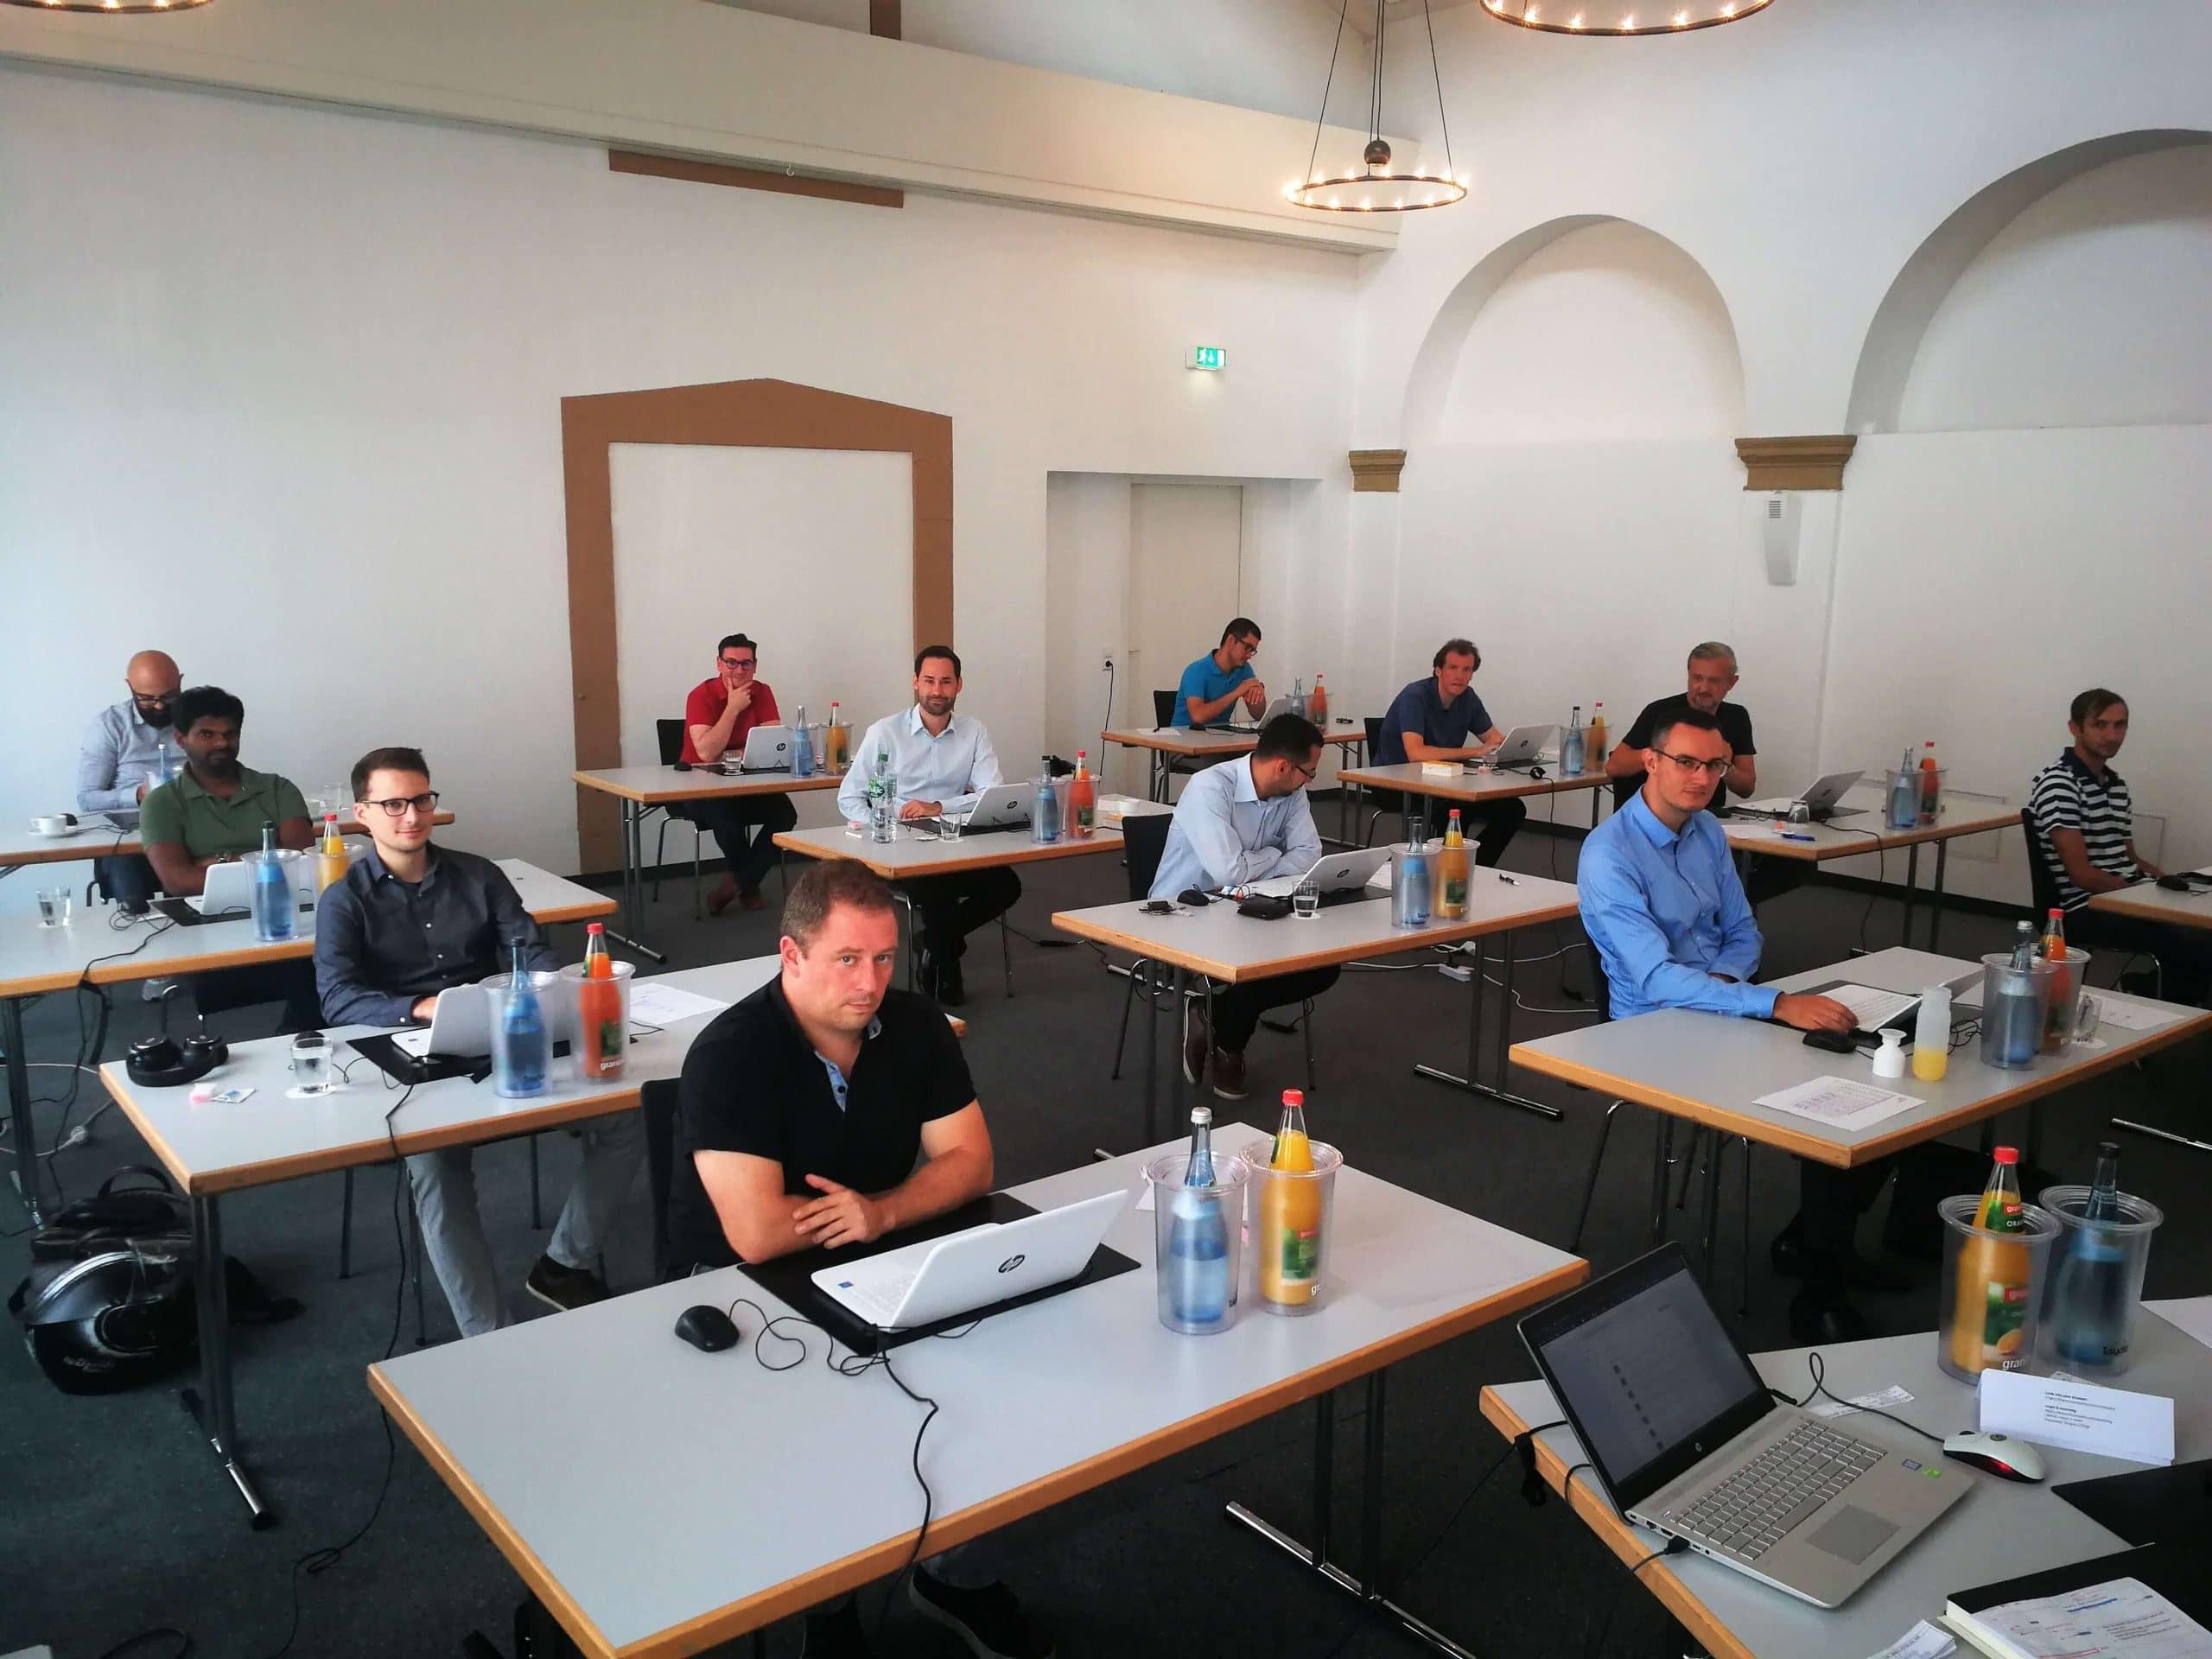 TOGAF® 9.2 August 2019 Ludwigsburg MHP incompany Erste Inhouse-Schulung für MHP